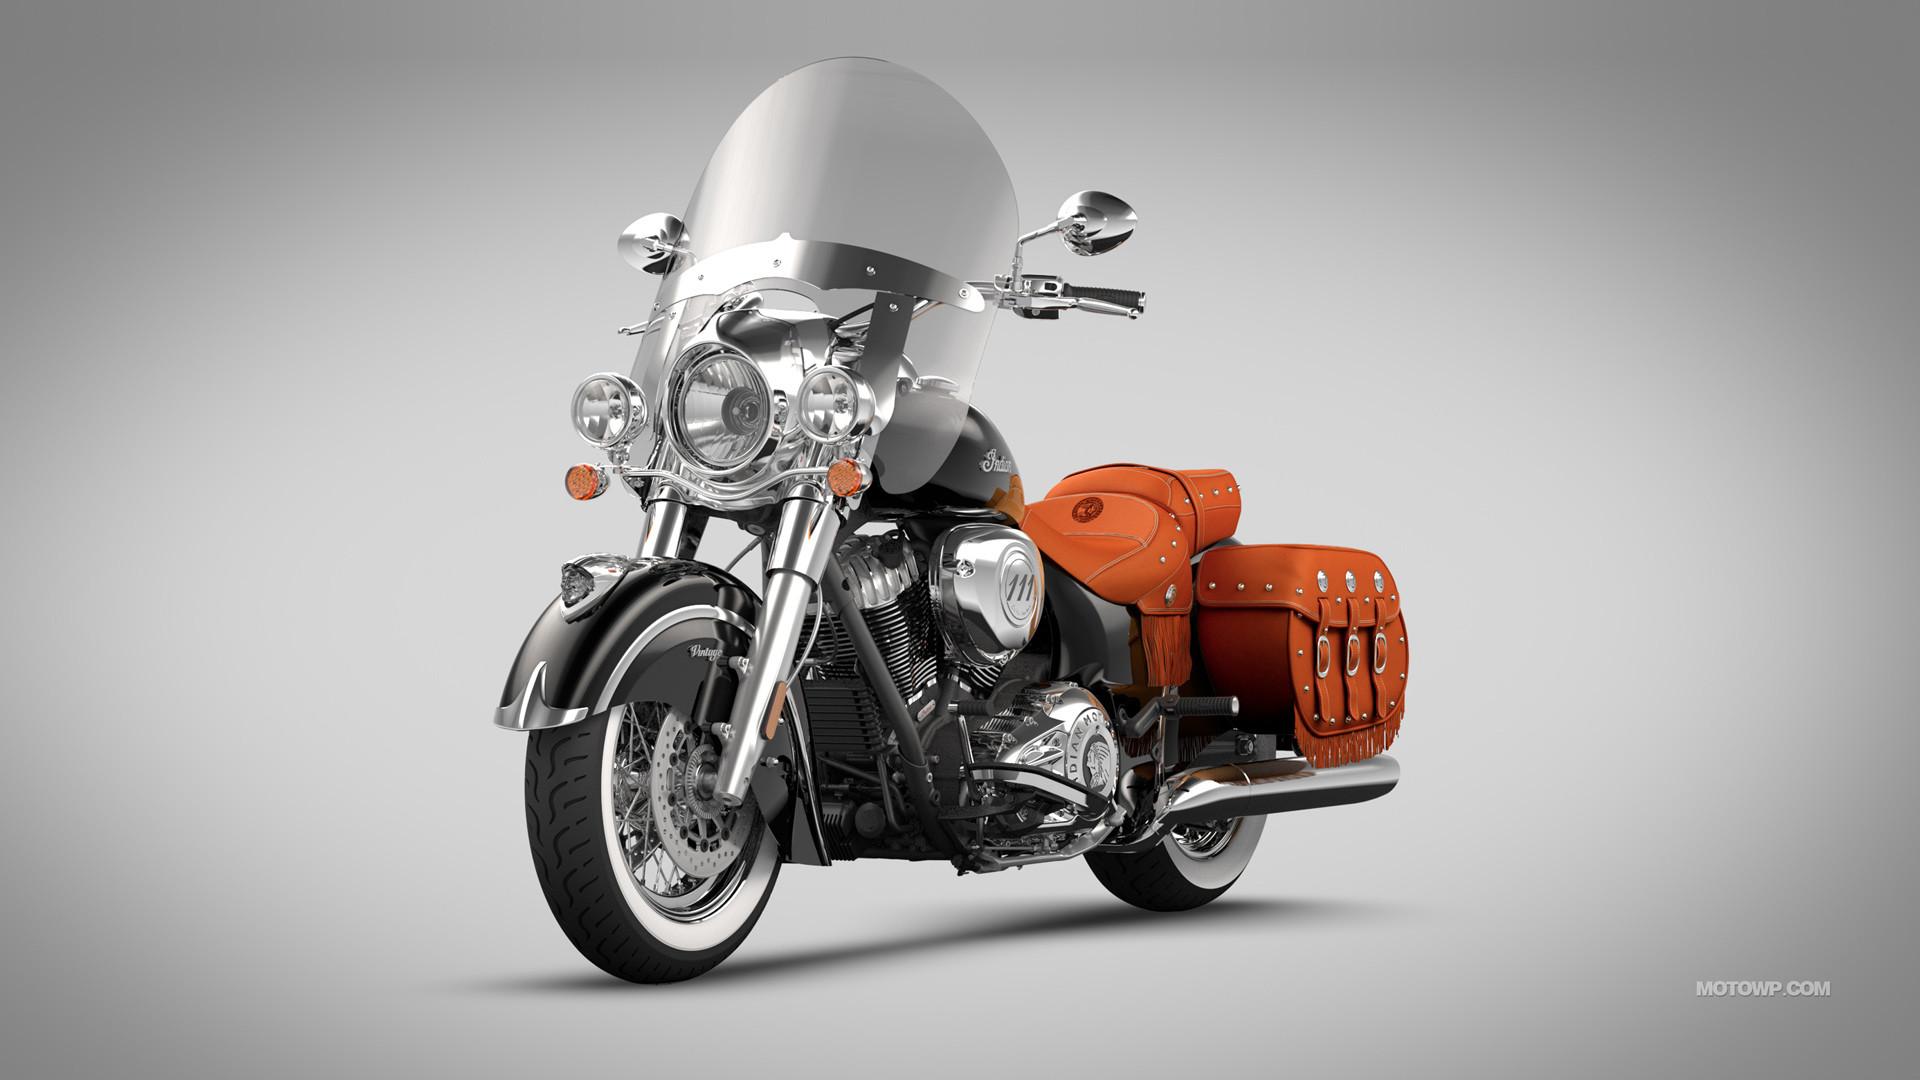 indian motorcycle desktop wallpaper (57+ images)